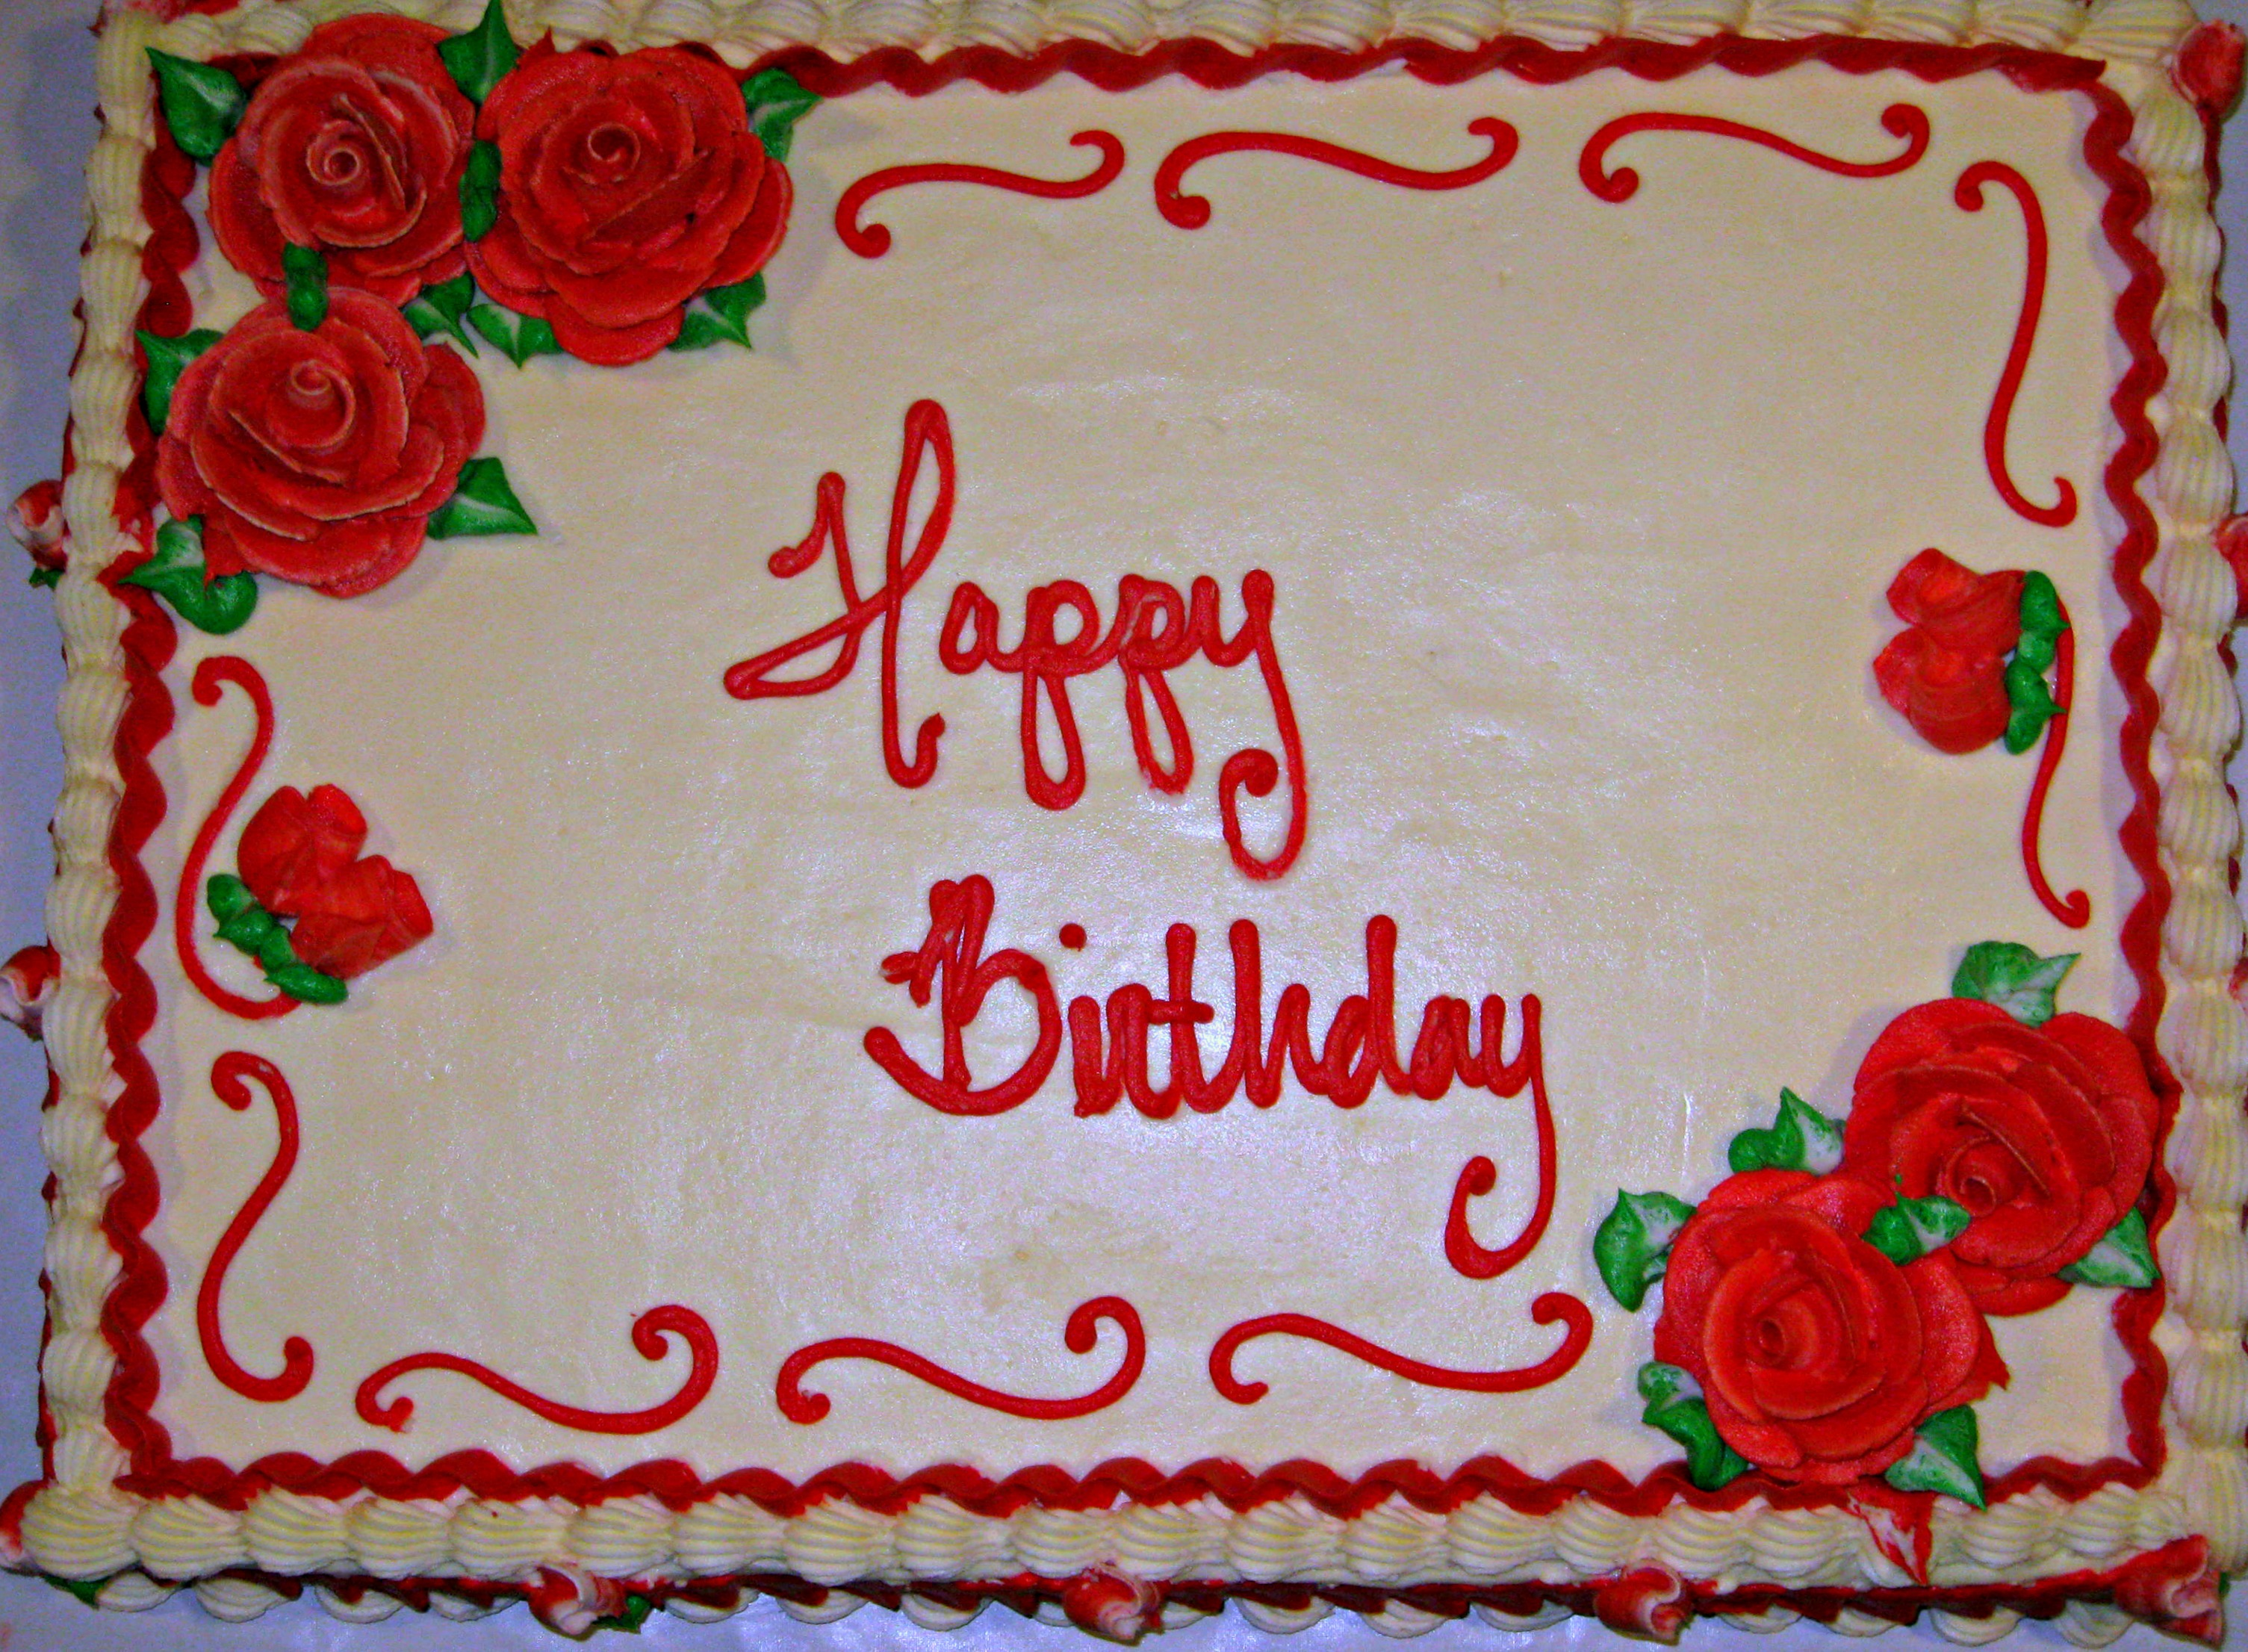 Astounding 7 January Sheet Cakes Photo Sheet Cake Decorating Ideas Happy Personalised Birthday Cards Cominlily Jamesorg